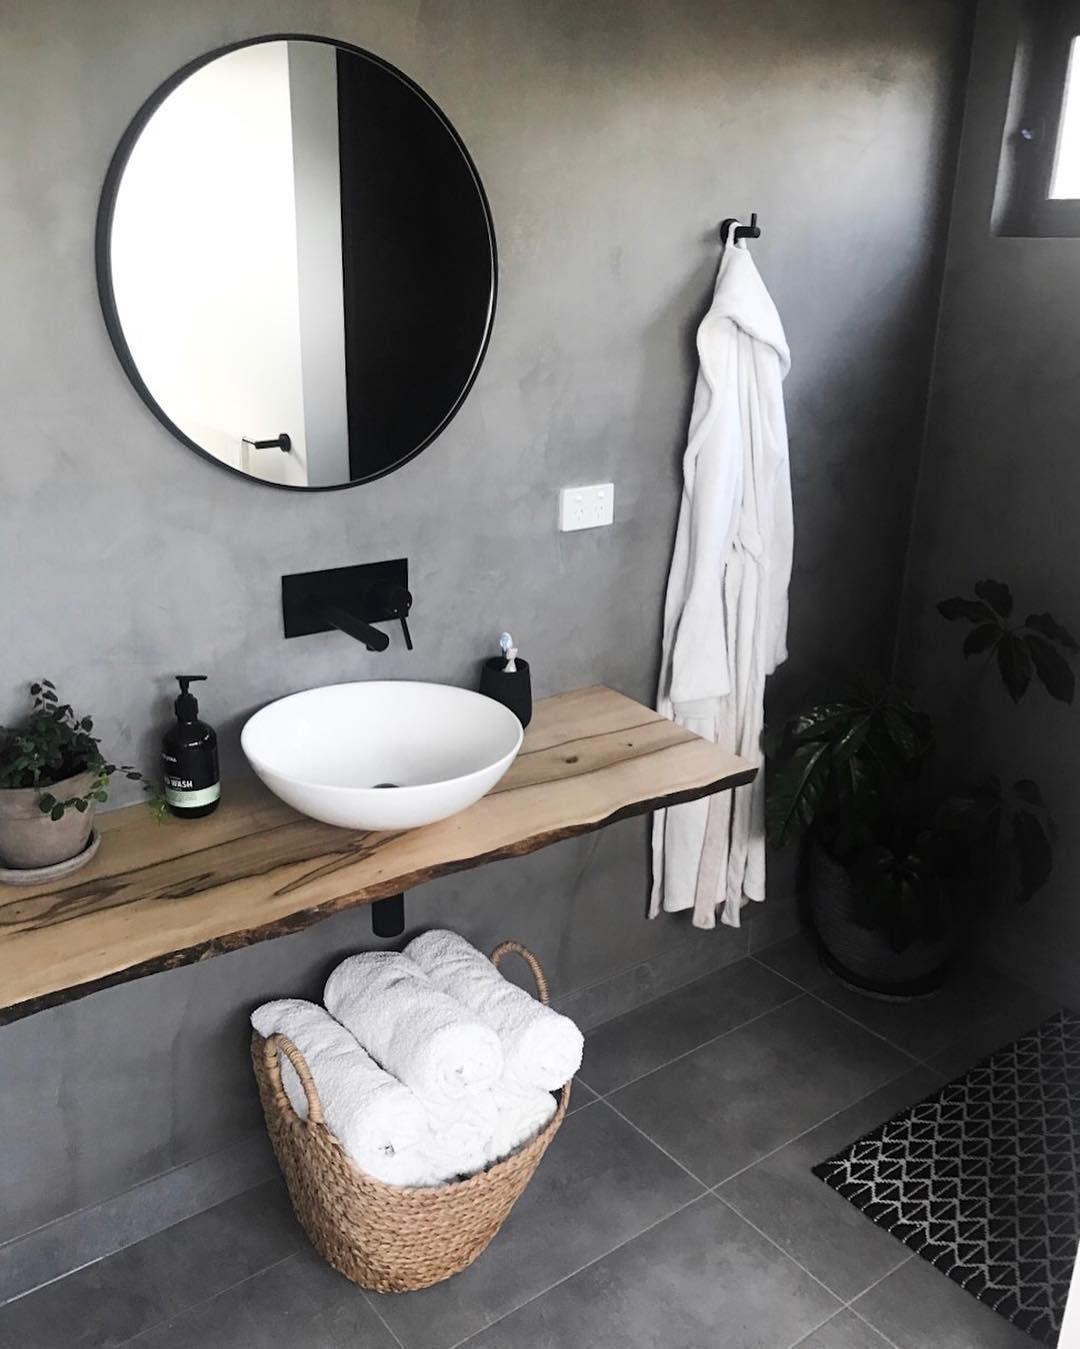 Matte Black Taps, Tapware, Showers & Accessories